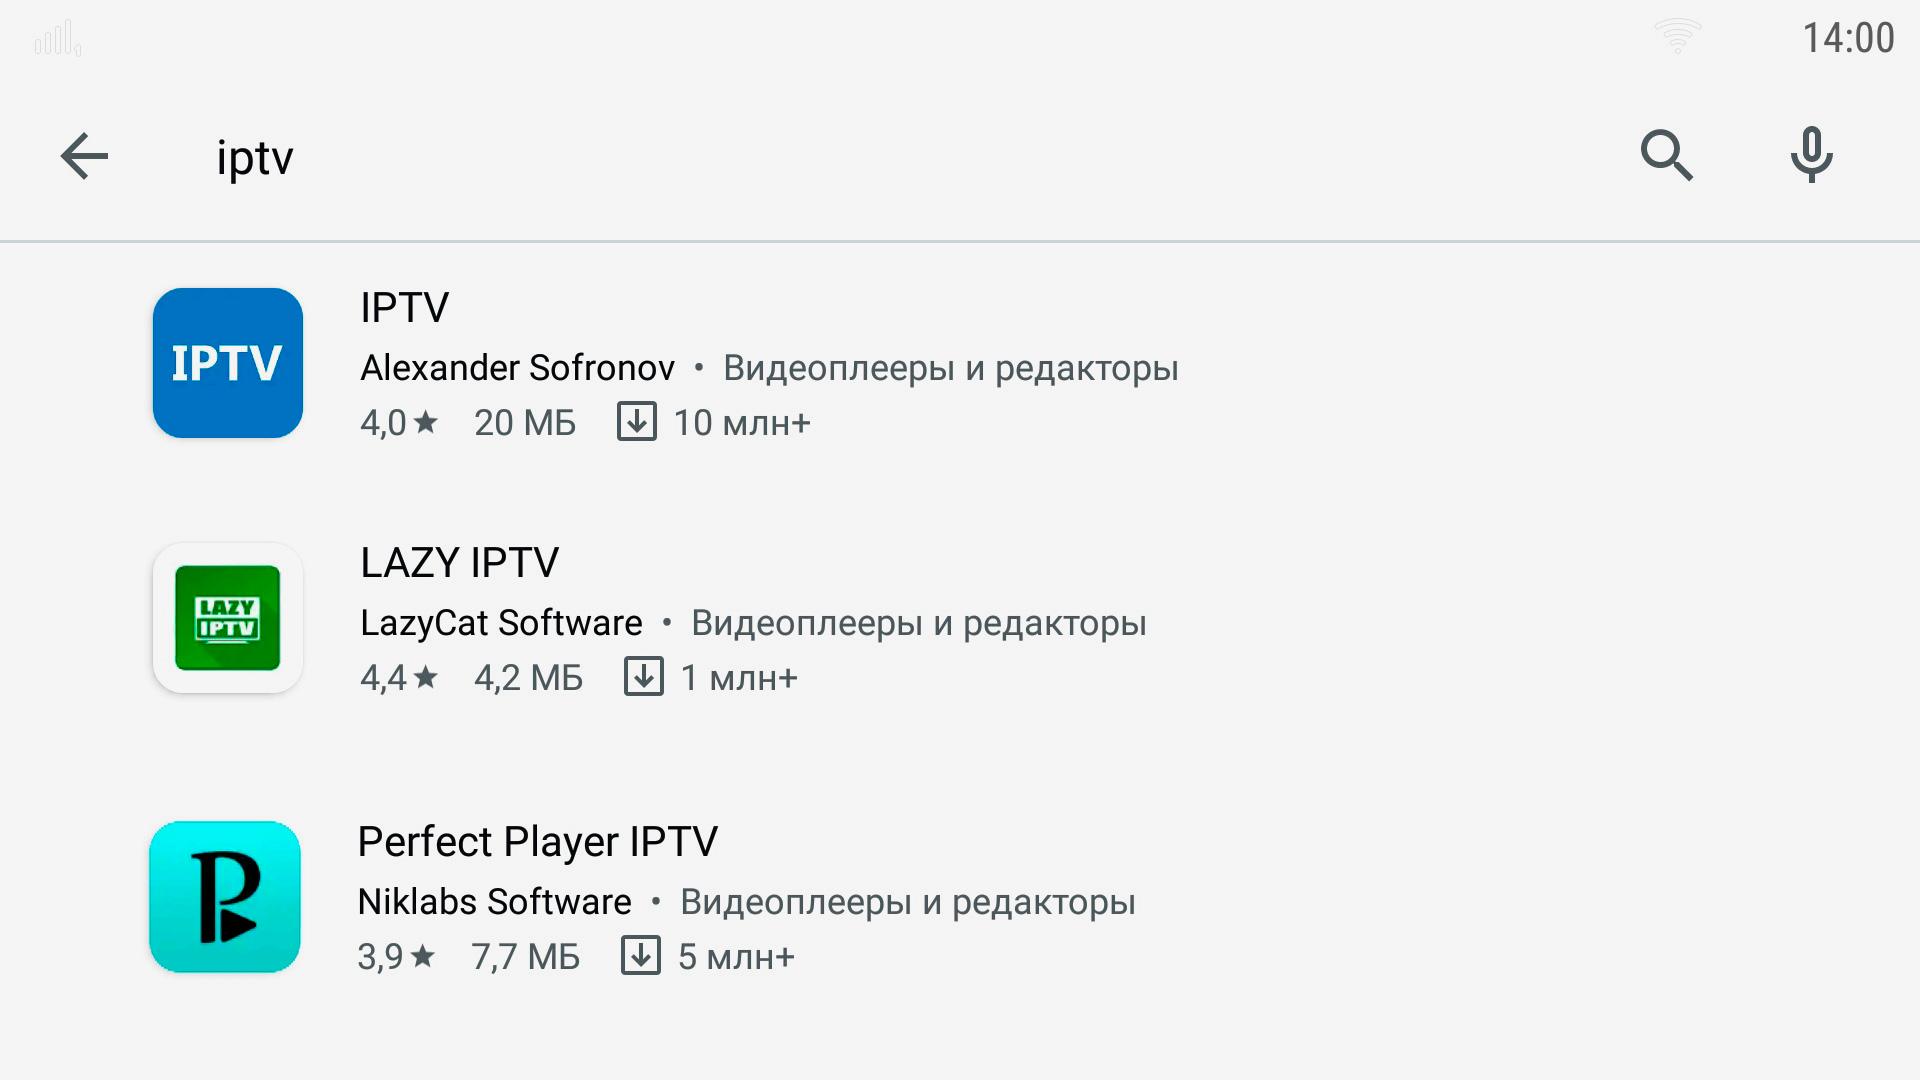 LAZY IPTV и Perfect Player